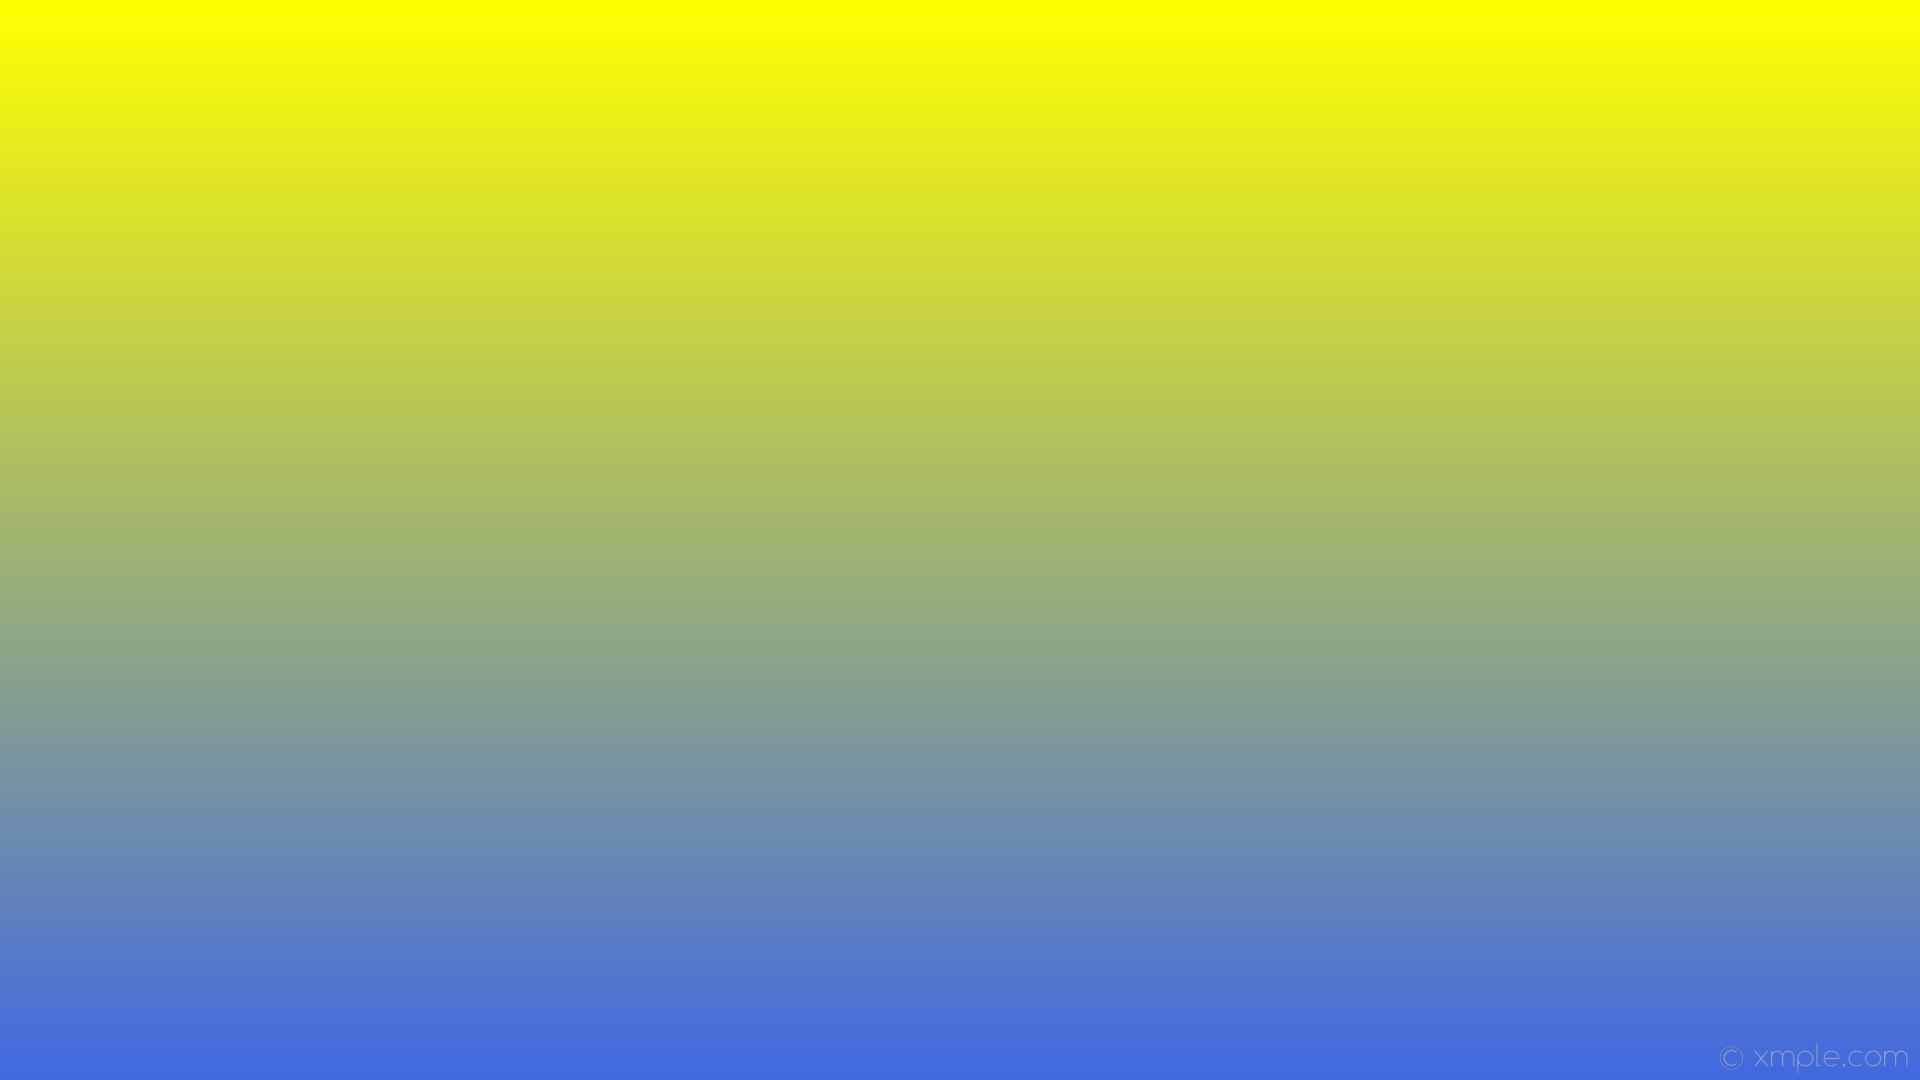 wallpaper yellow blue gradient linear royal blue #ffff00 #4169e1 90°